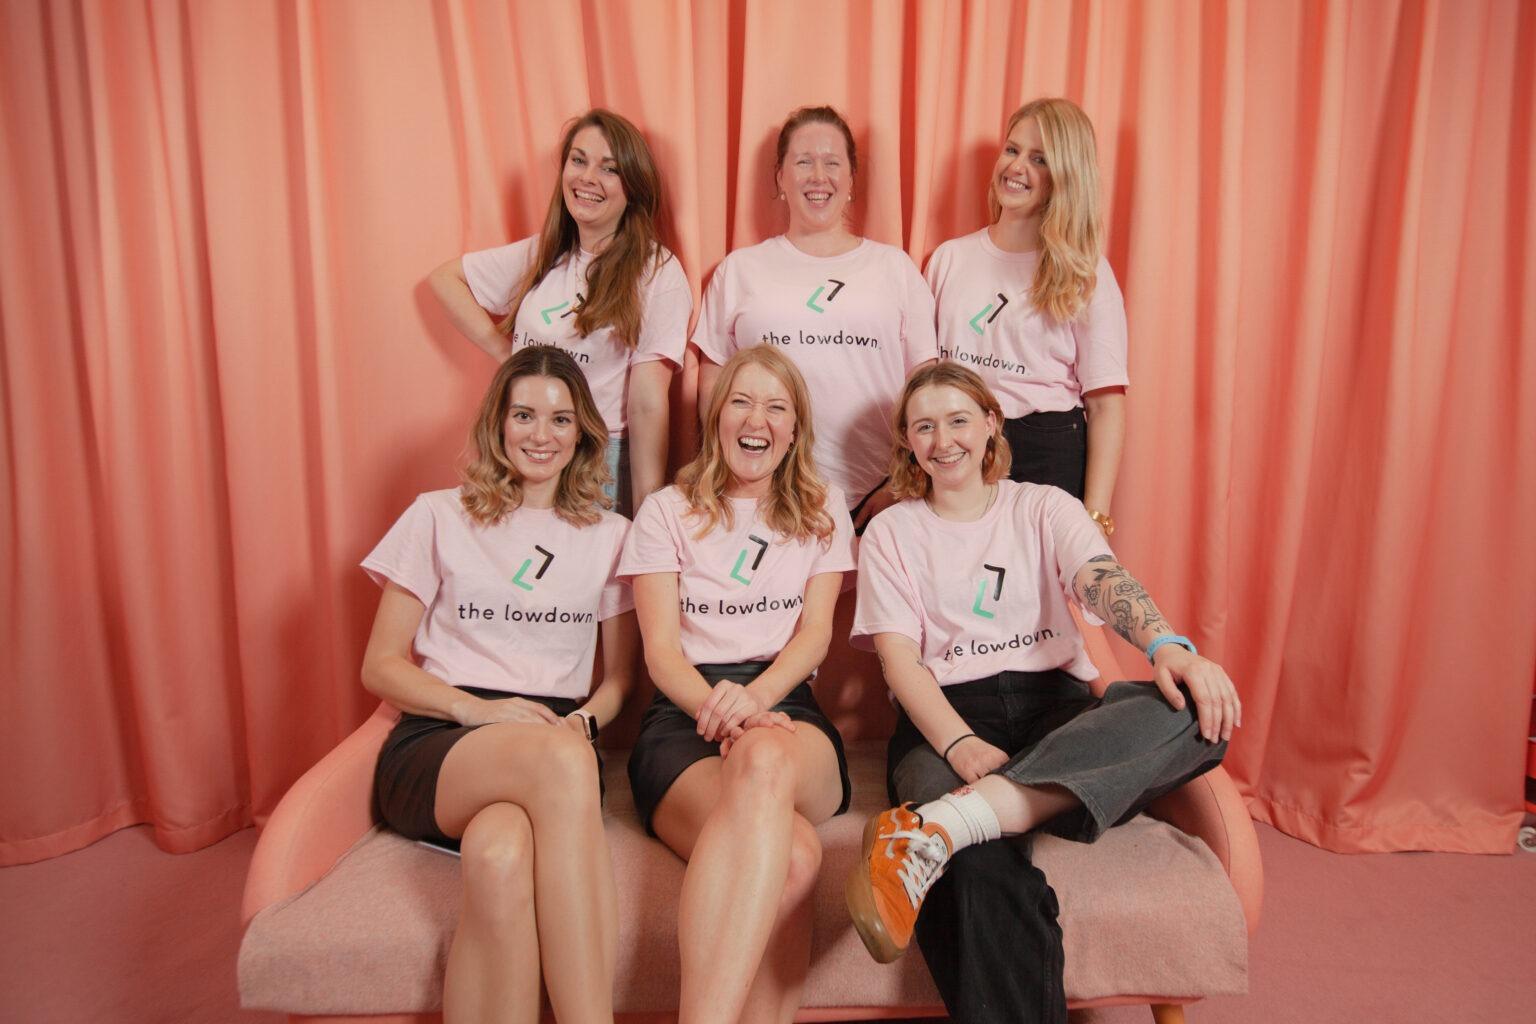 The Lowdown - Contraceptive FemTech